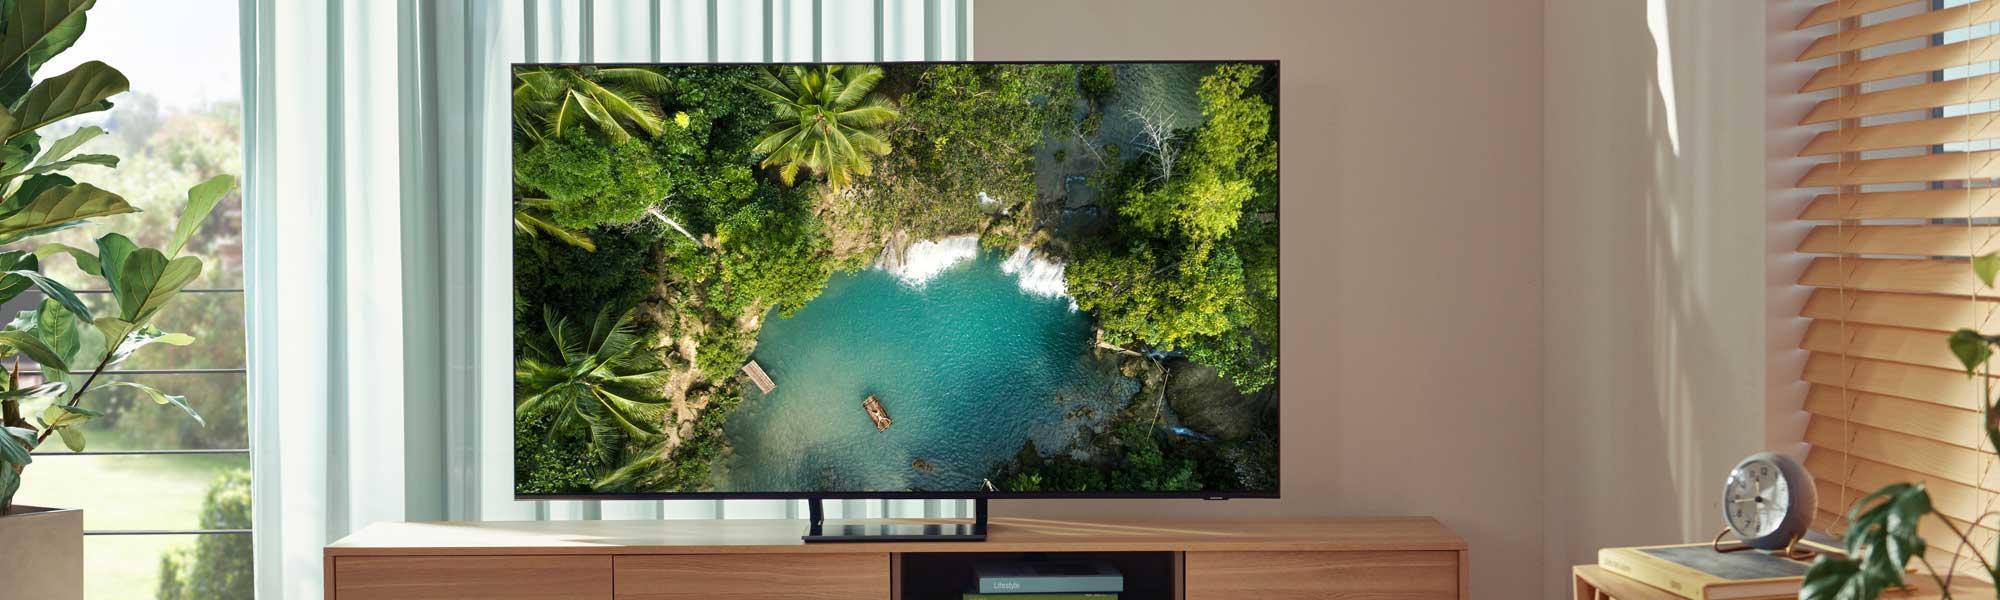 Samsung UE43AU9000KXXU (2021) 43 Inch Smart 4K Crystal UHD HDR TV